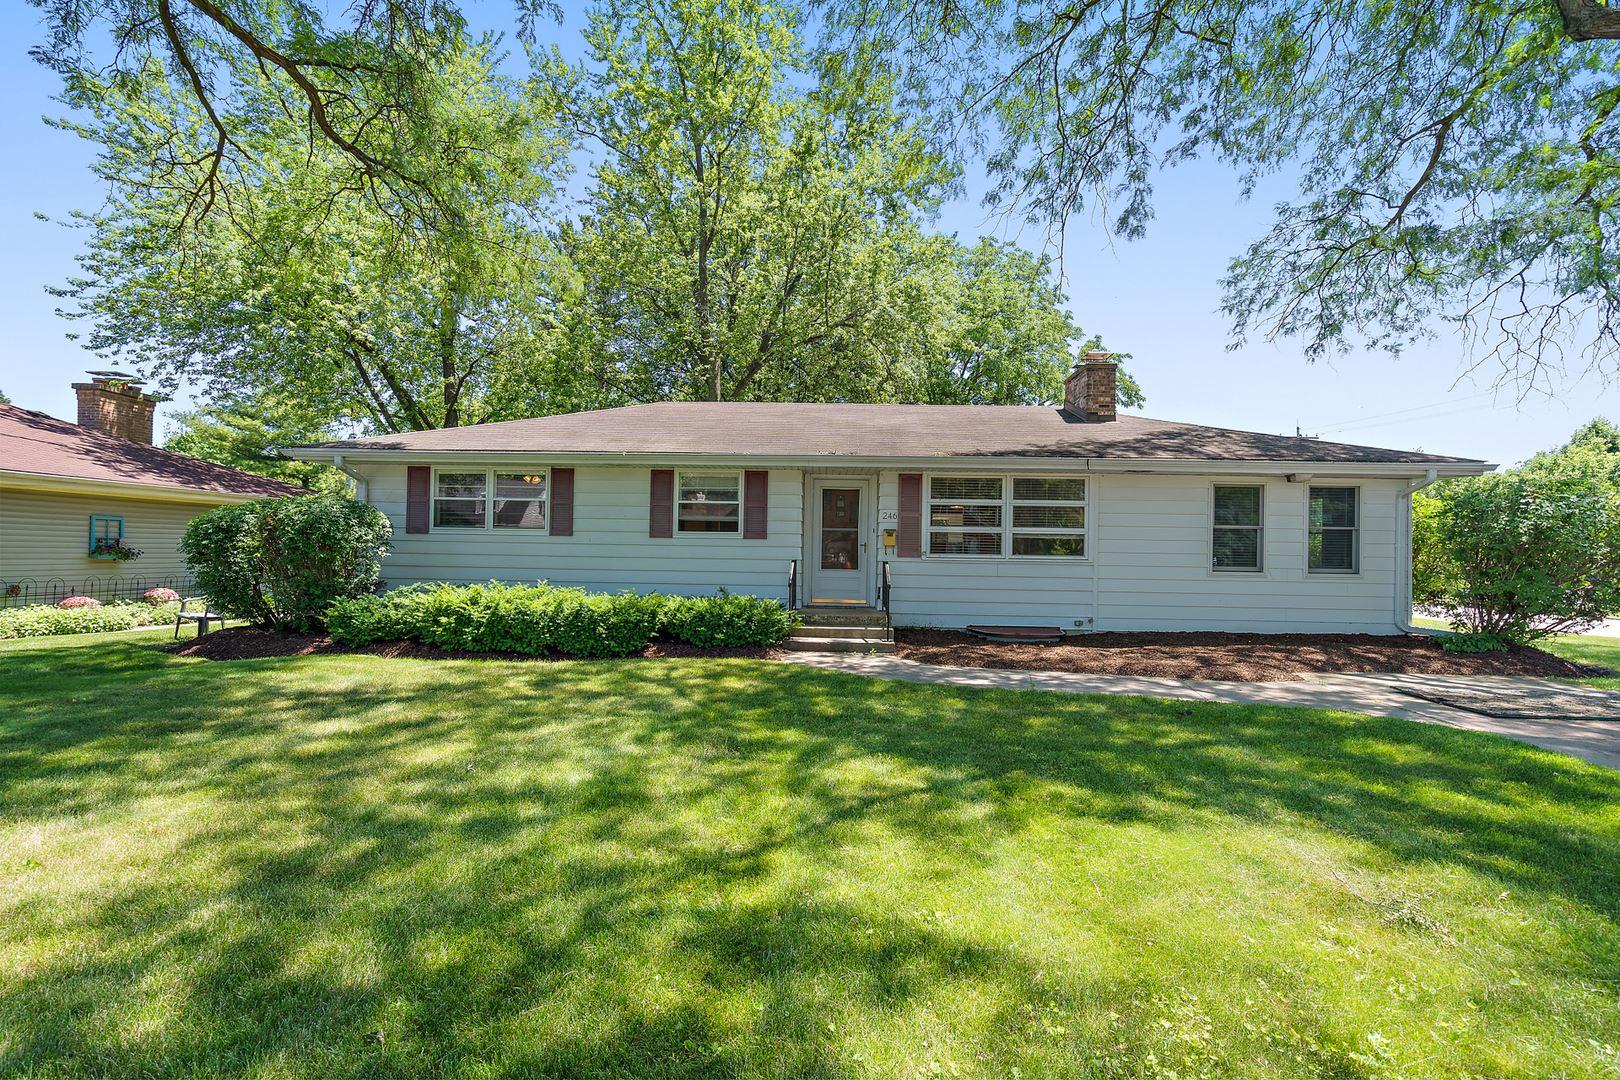 246 S Glenwood Place, Aurora, IL 60506 - #: 10751849